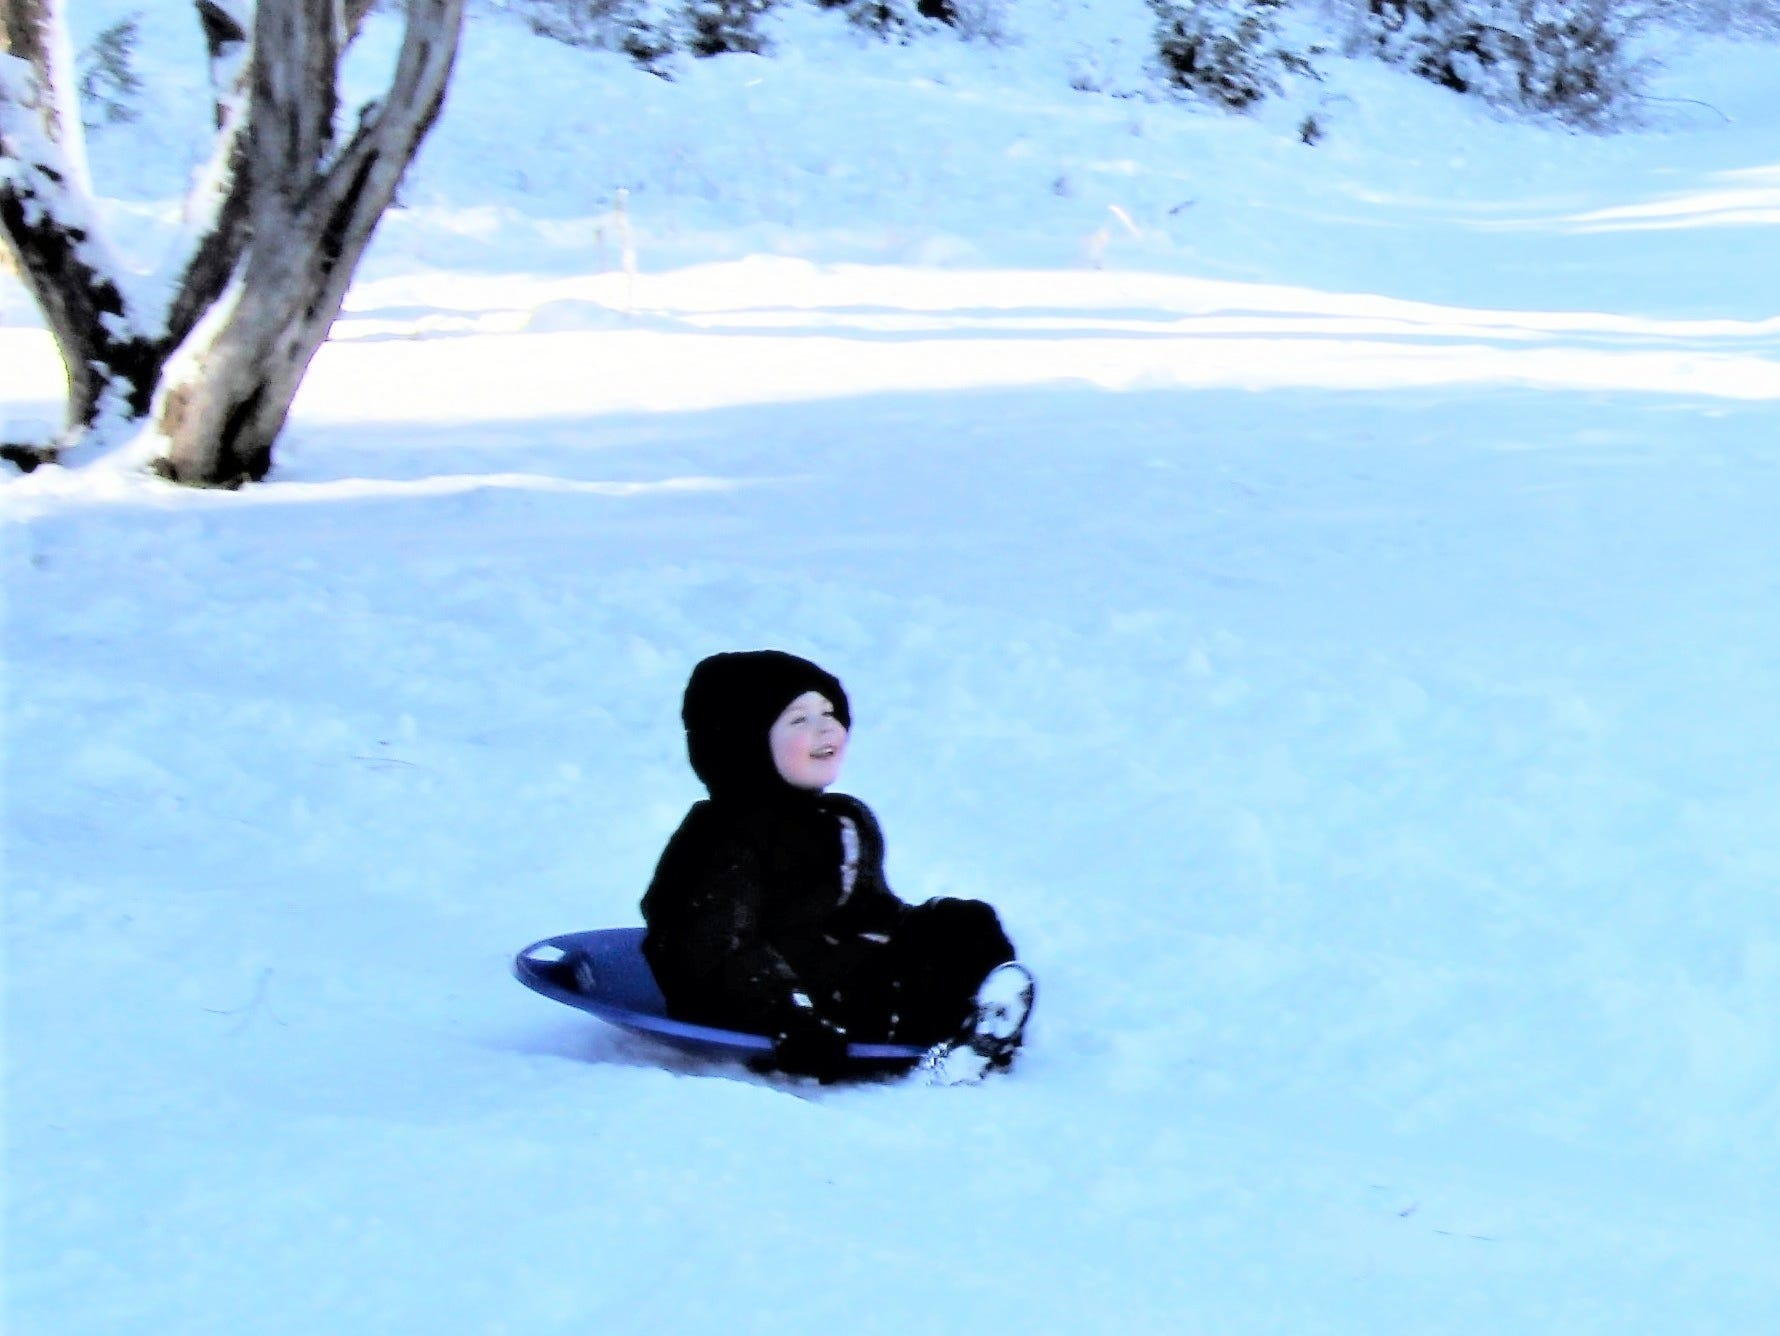 Nothing better than sledding on fresh snow in Ruidoso.